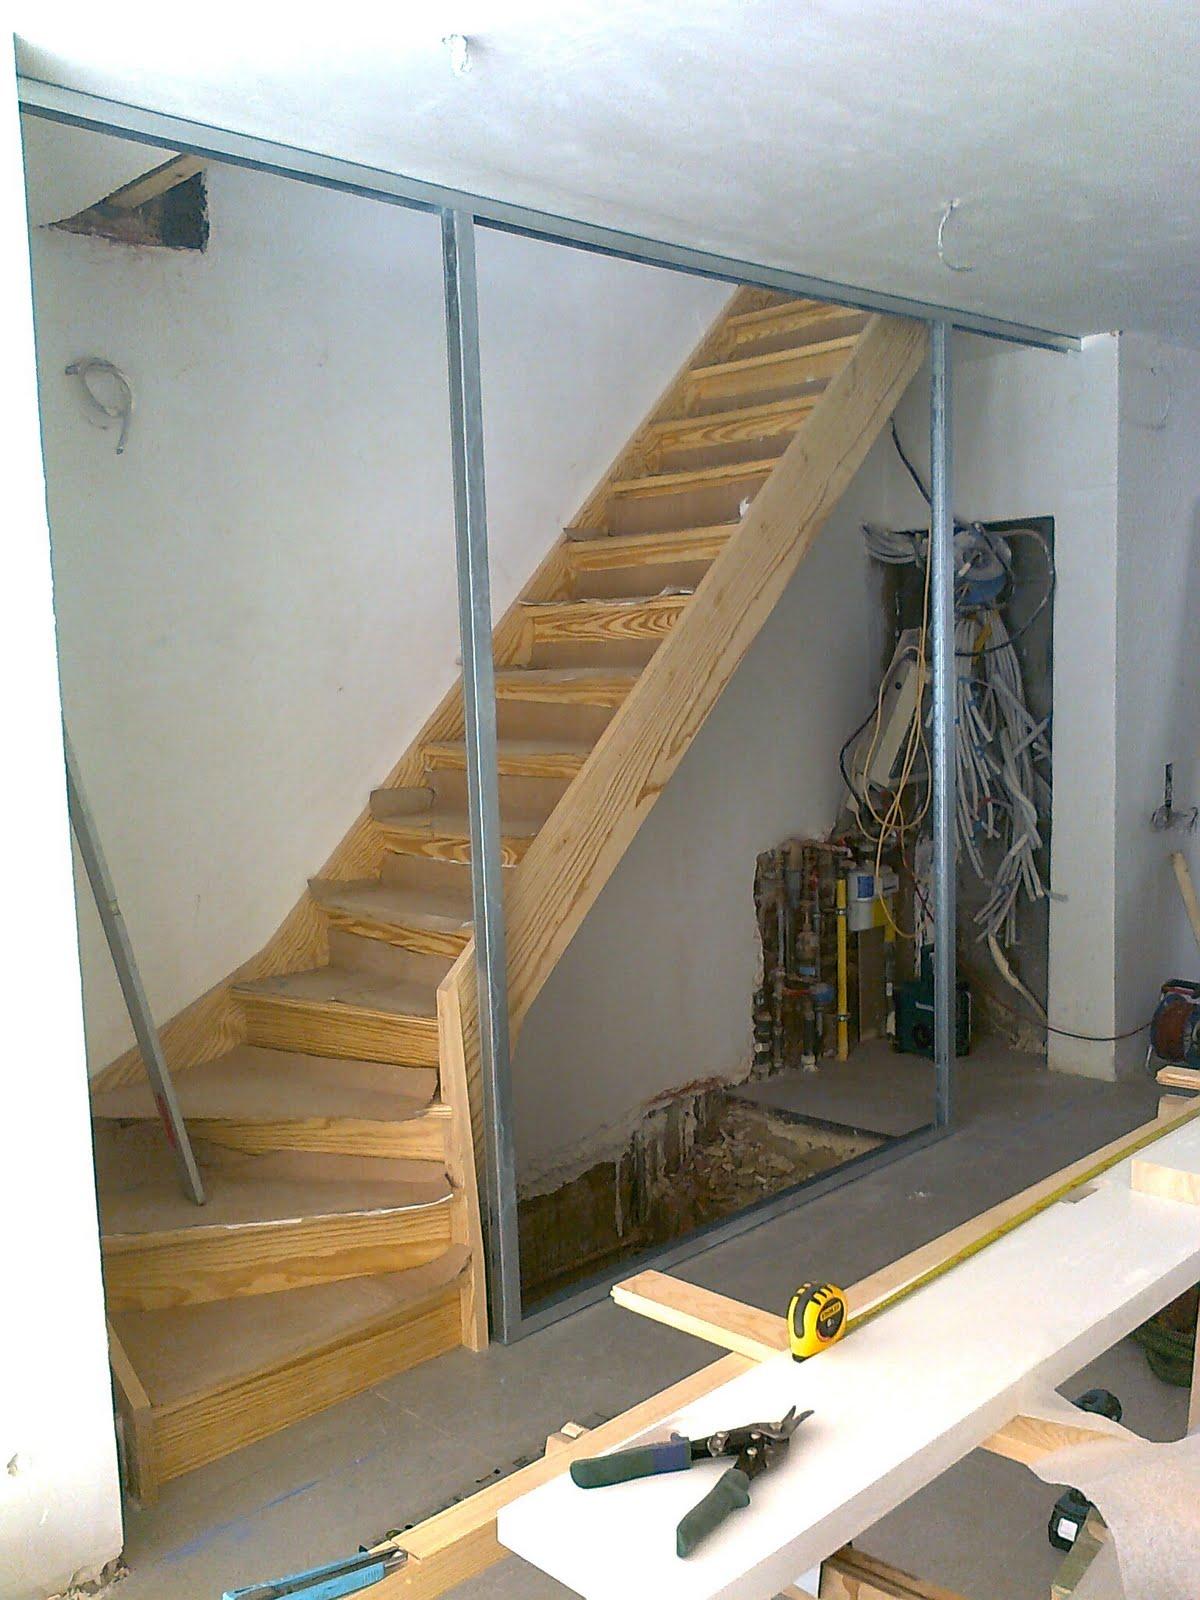 Cube de 2 mulhouse 2321 - Castorama escalier escamotable ...